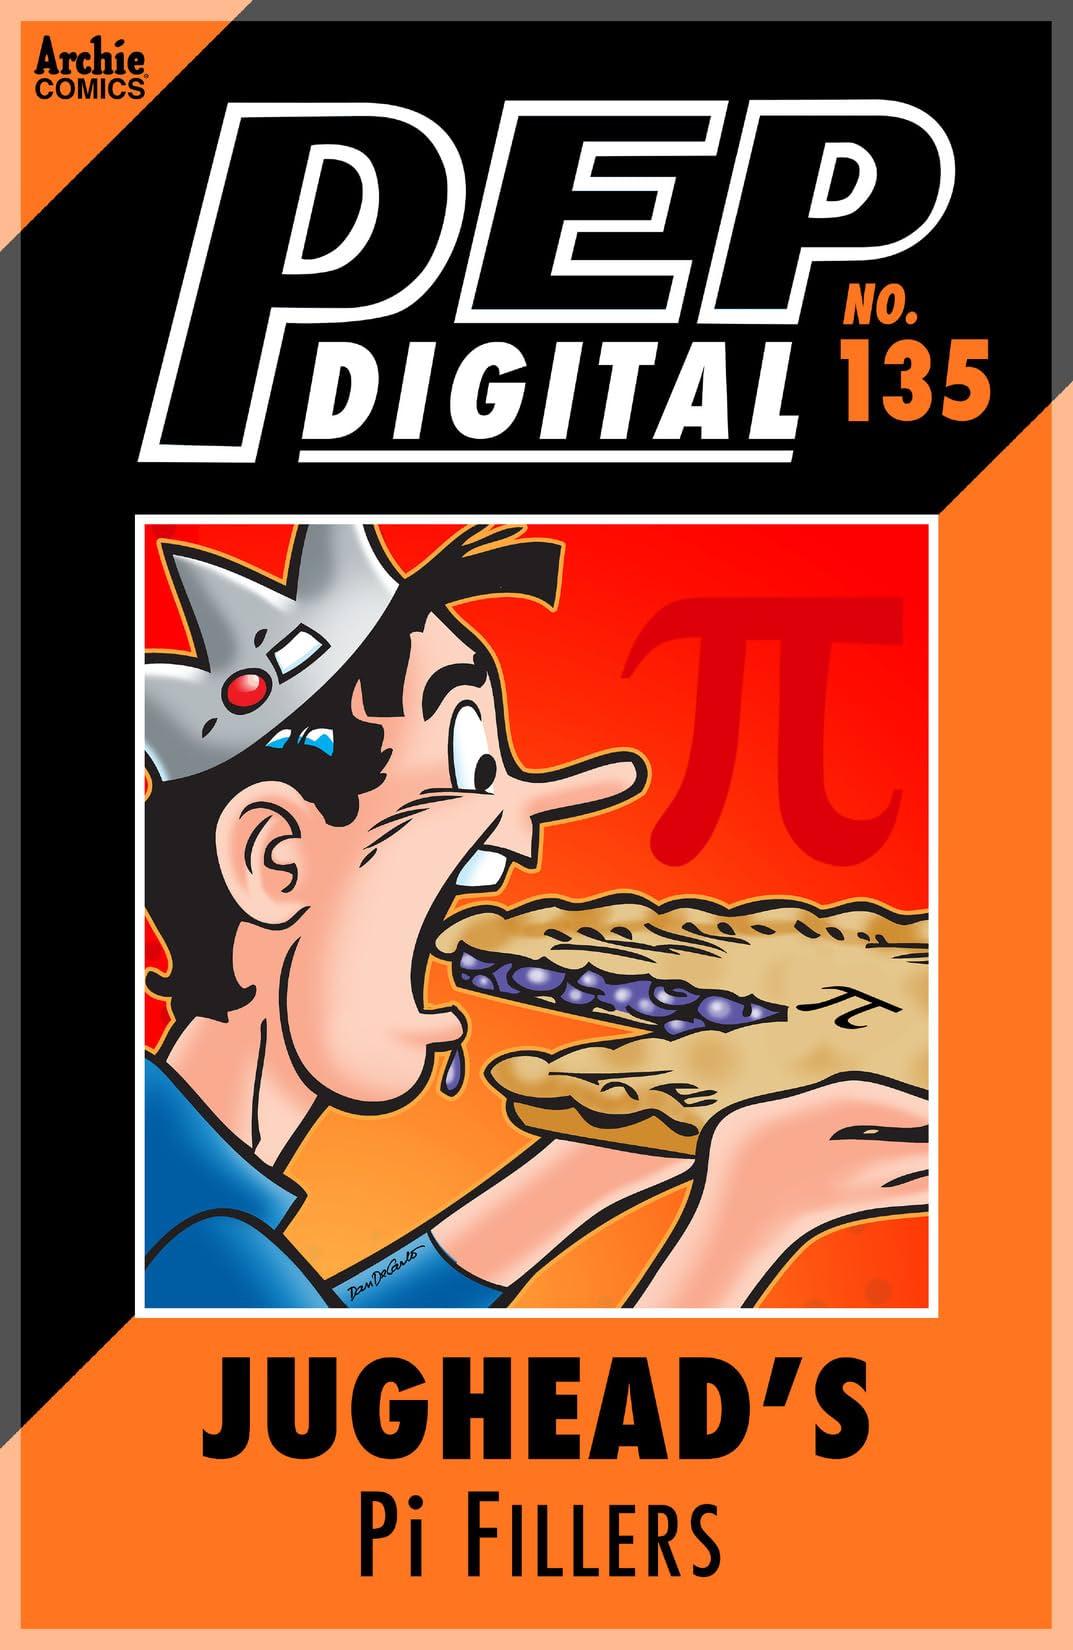 PEP Digital #135: Jughead's Pi Fillers